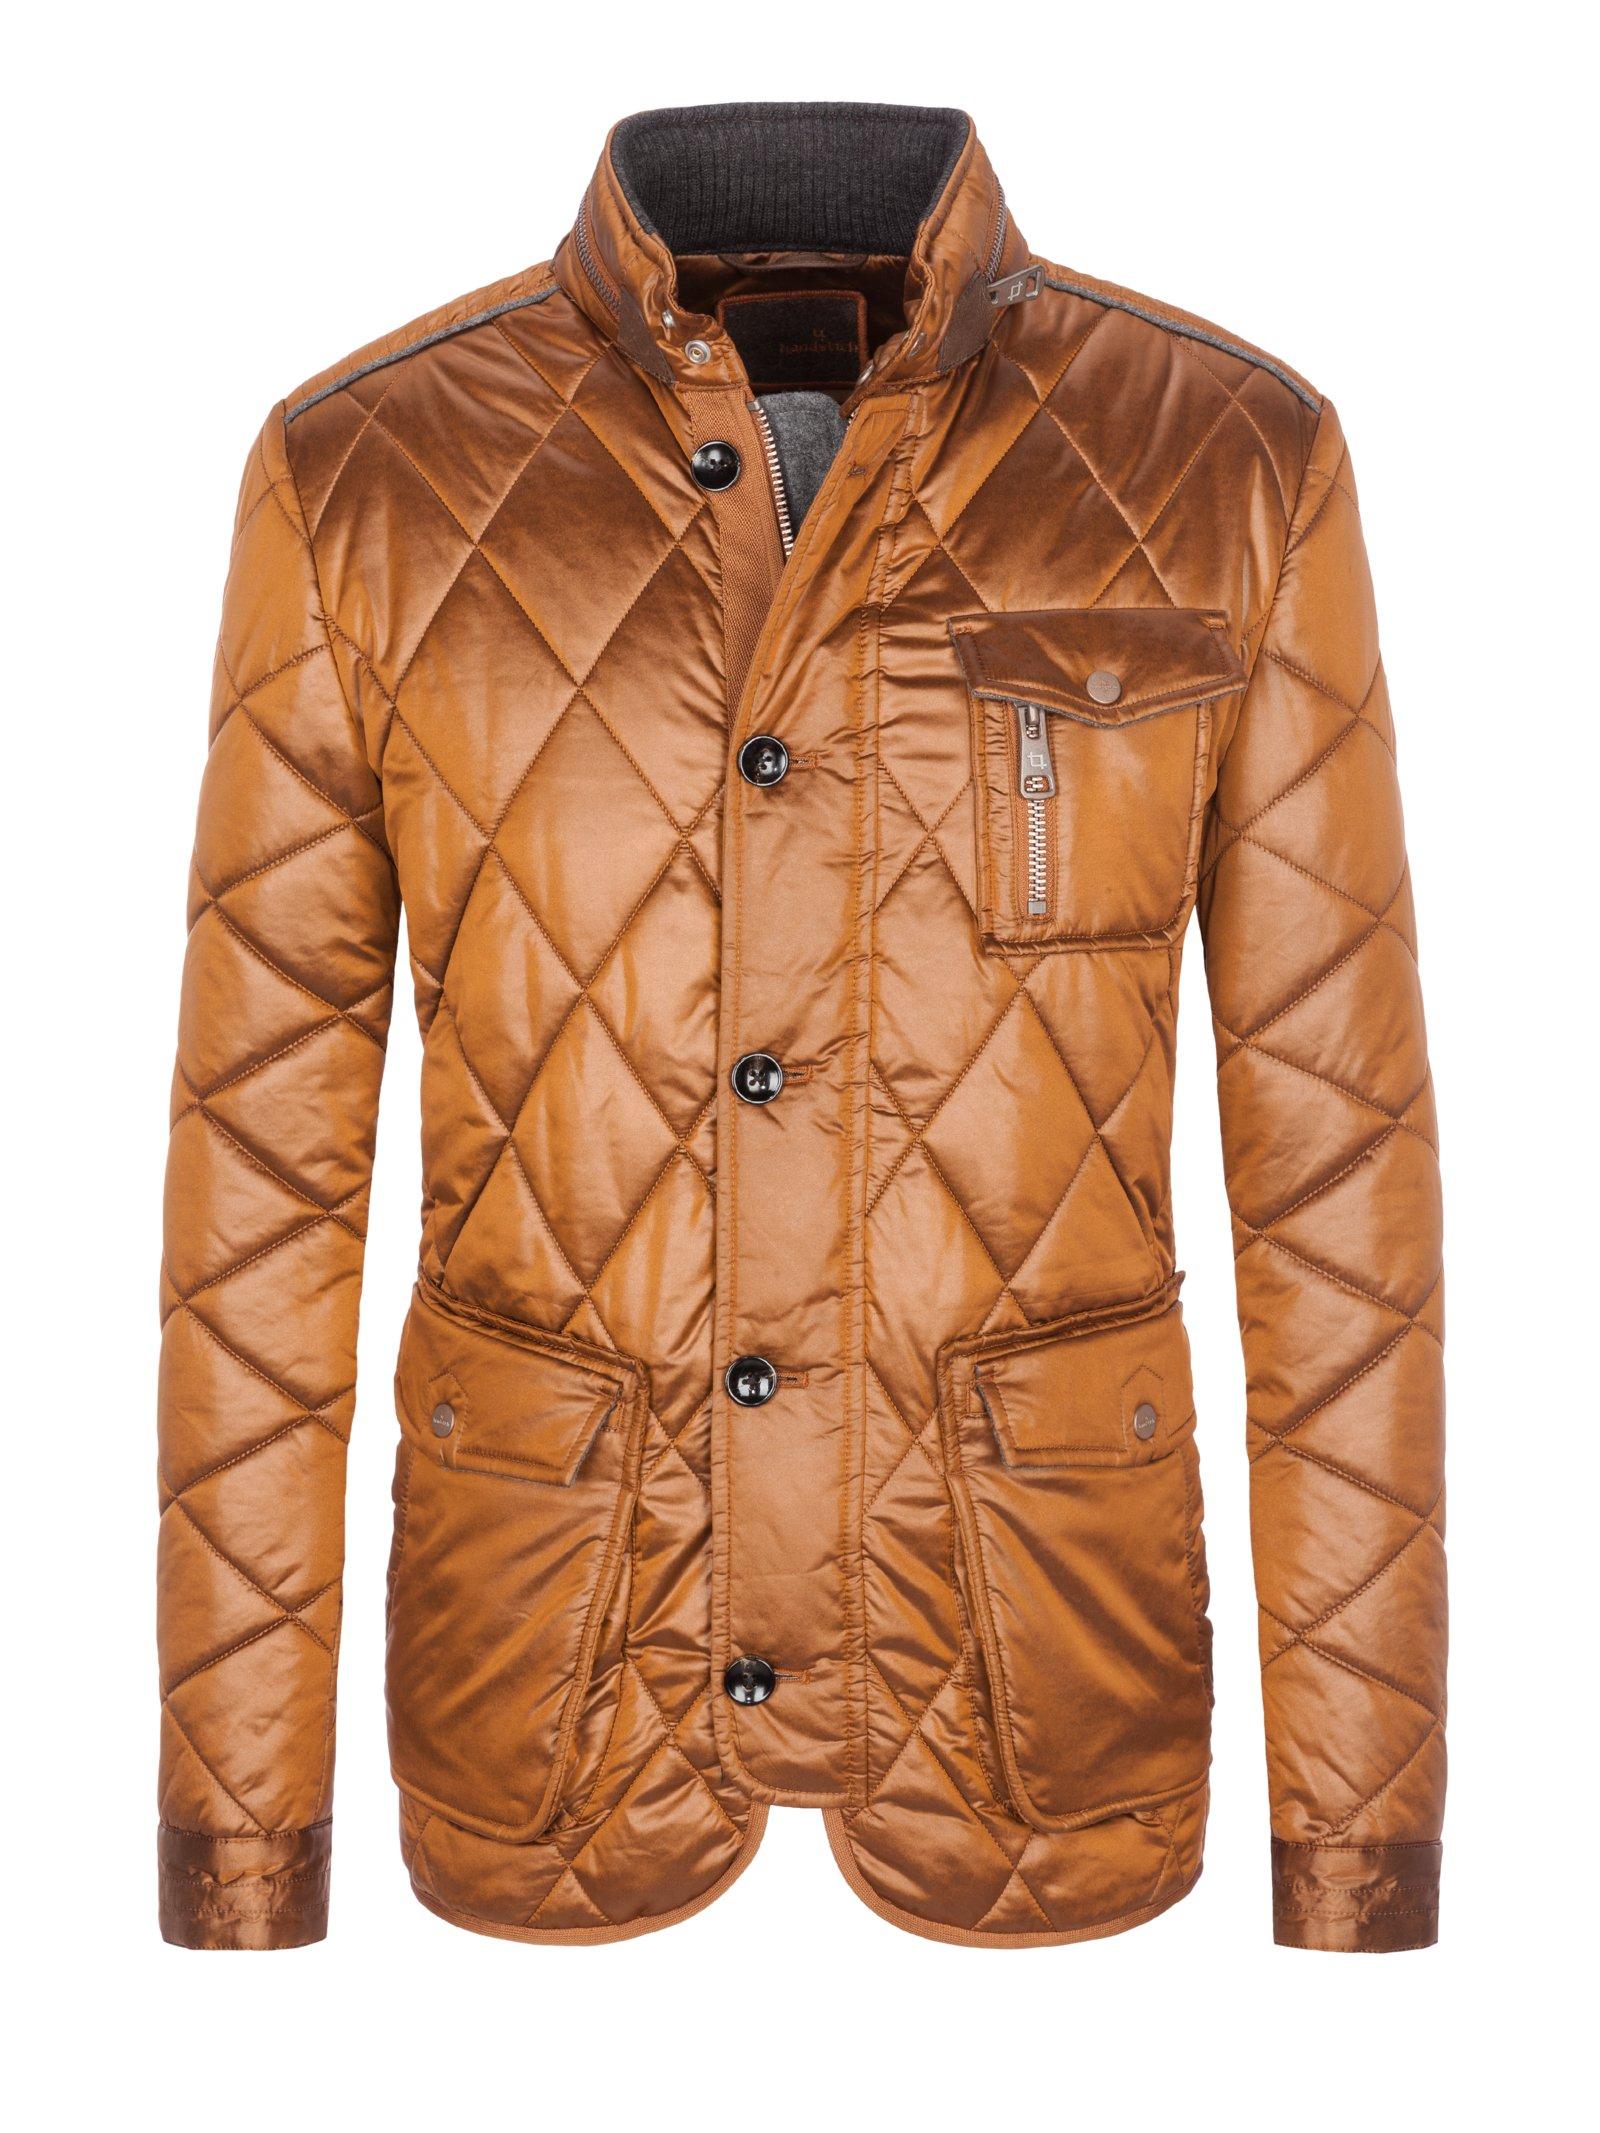 Handstich modische Winterjacke petrol   Jacken, Winterjacken